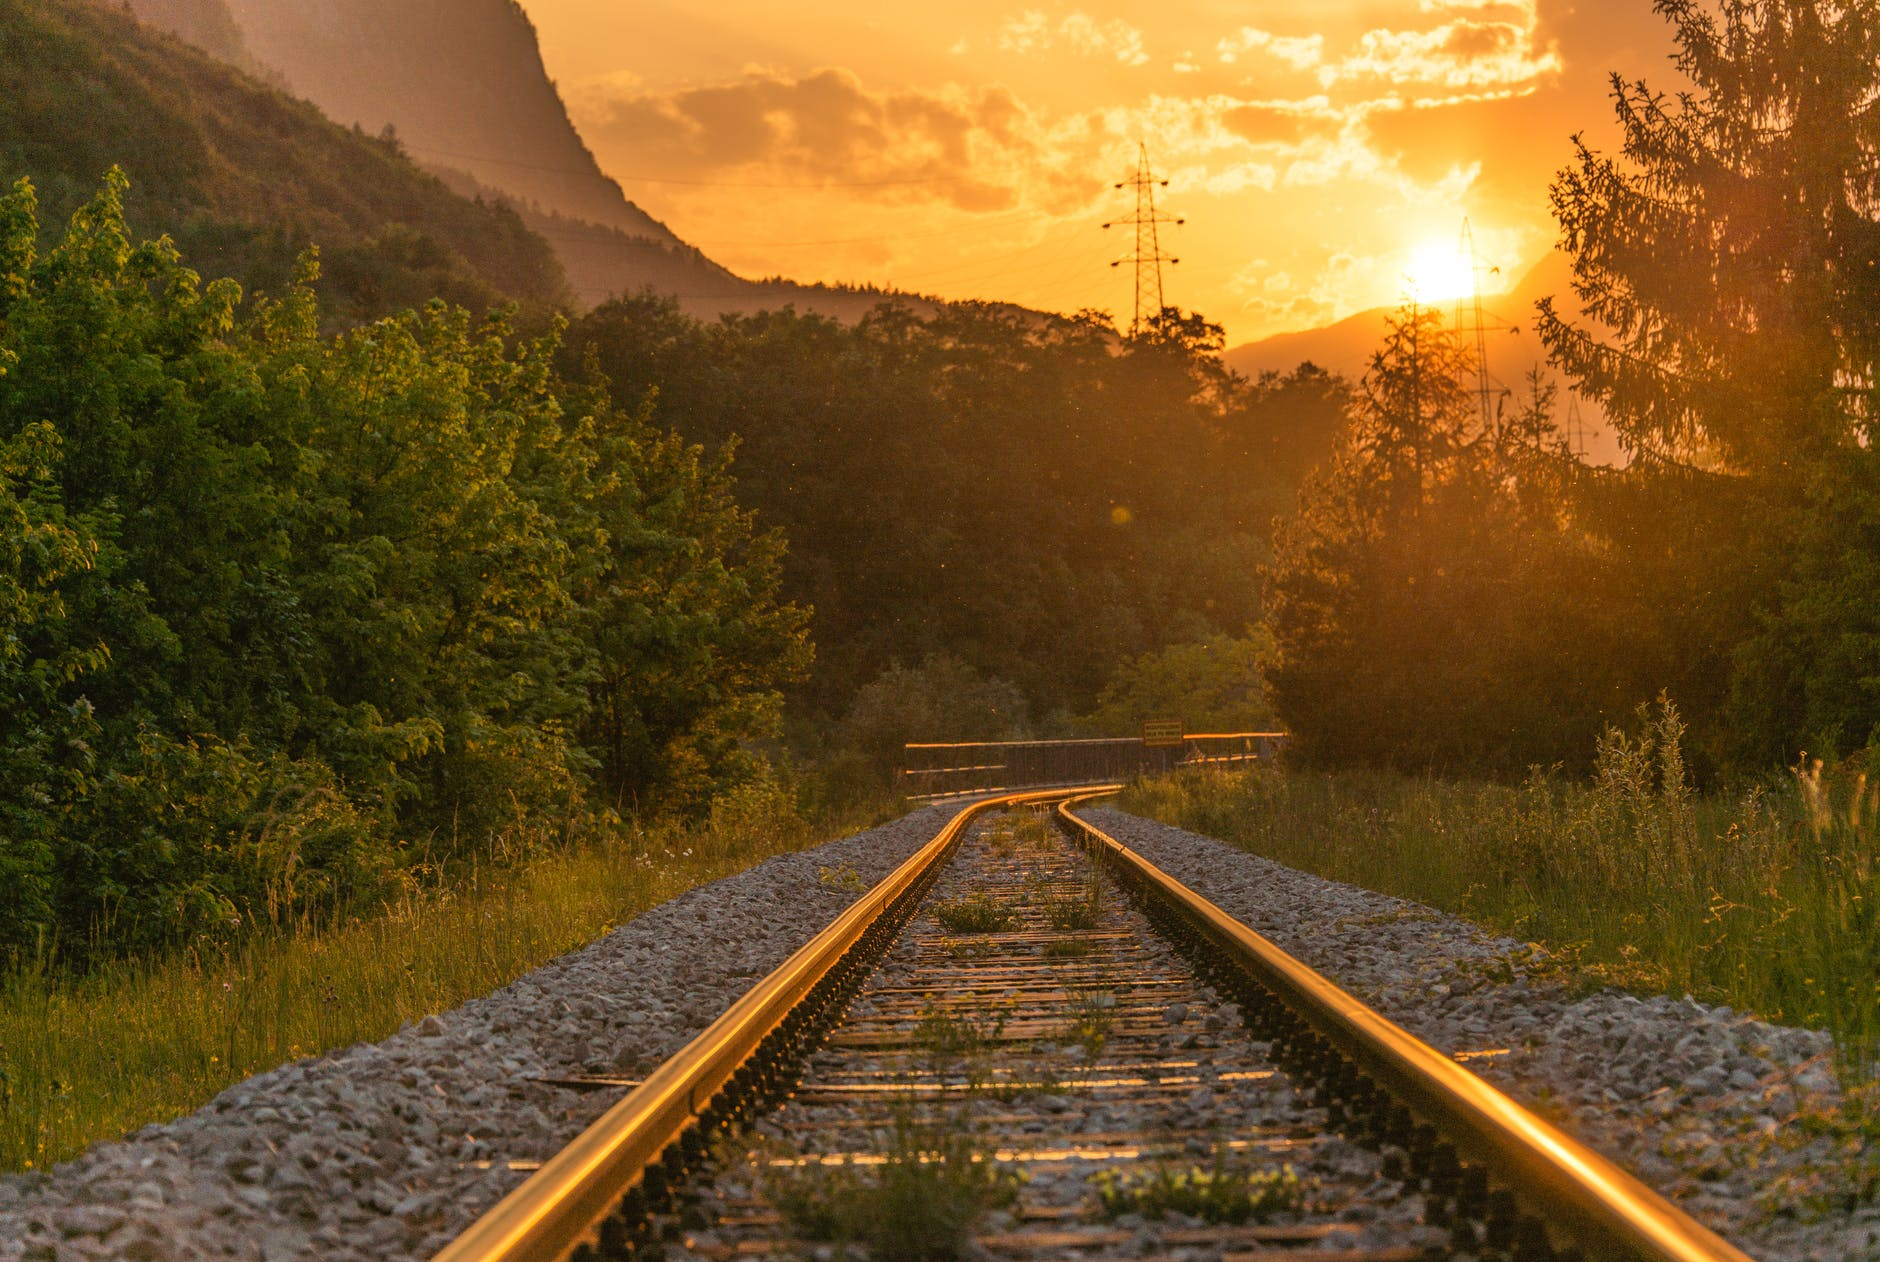 train railway near trees